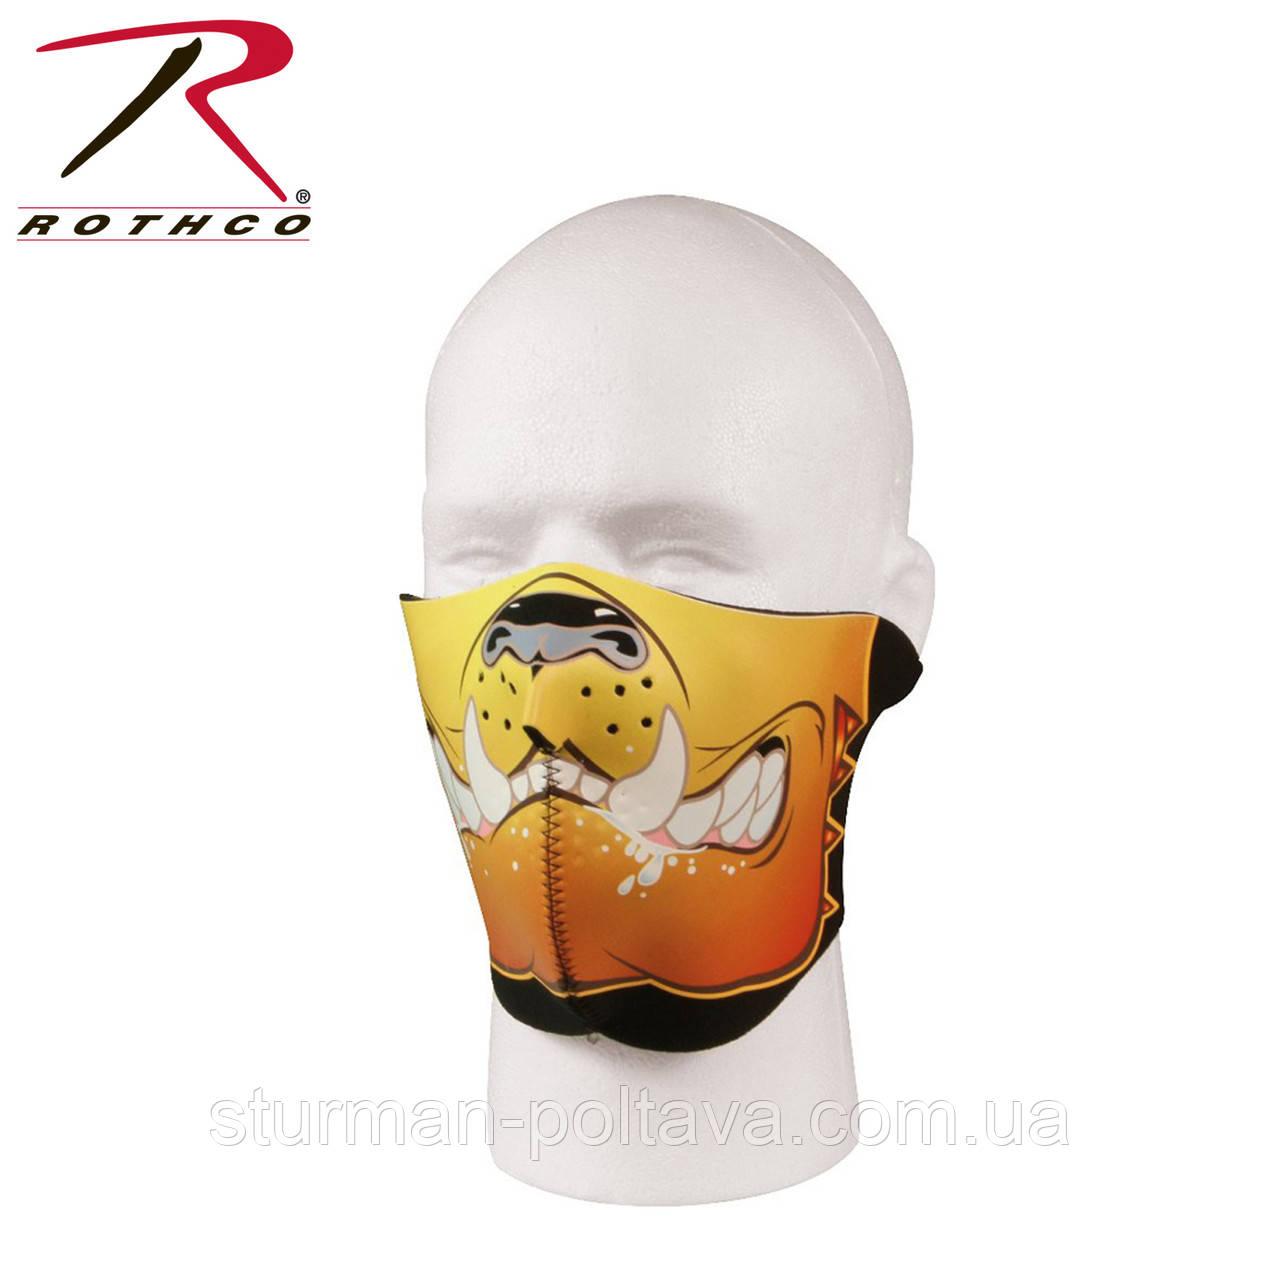 "Термомаска на обличчя неопренова з малюнком ""Bulldog"" (Rothco) USA"